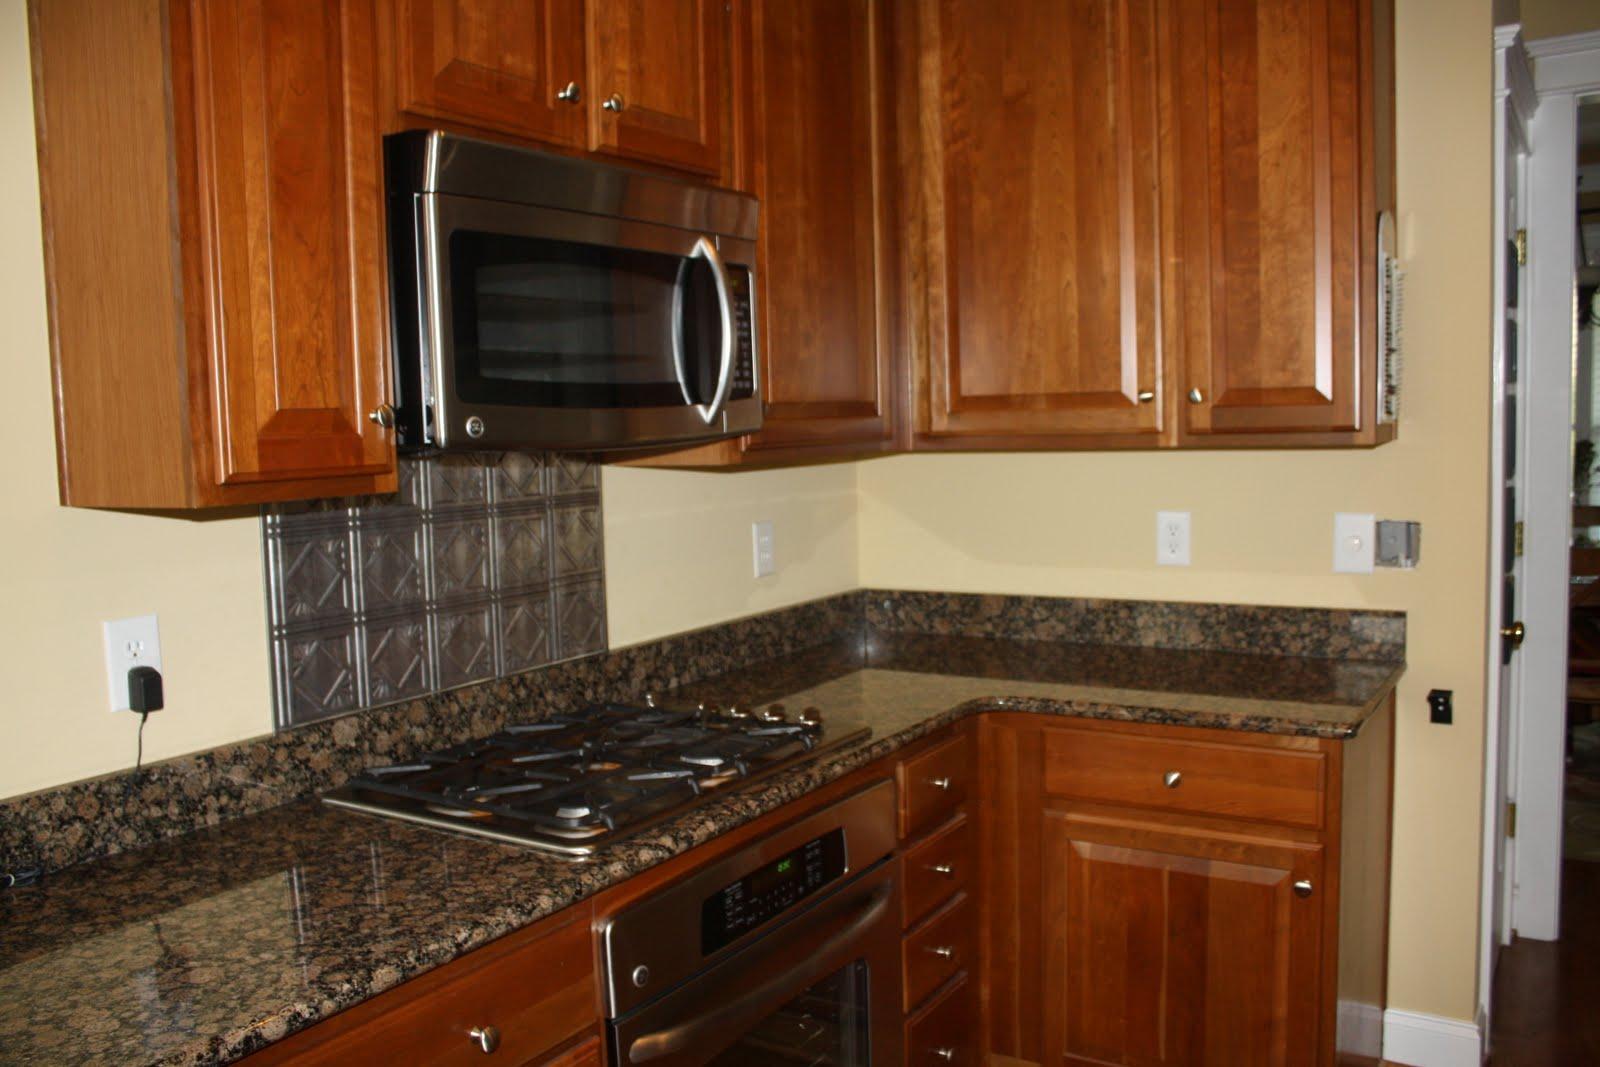 100 kitchen backsplash tin tin tiles for backsplash in kitchen backsplash tin tile backsplash behind stove only